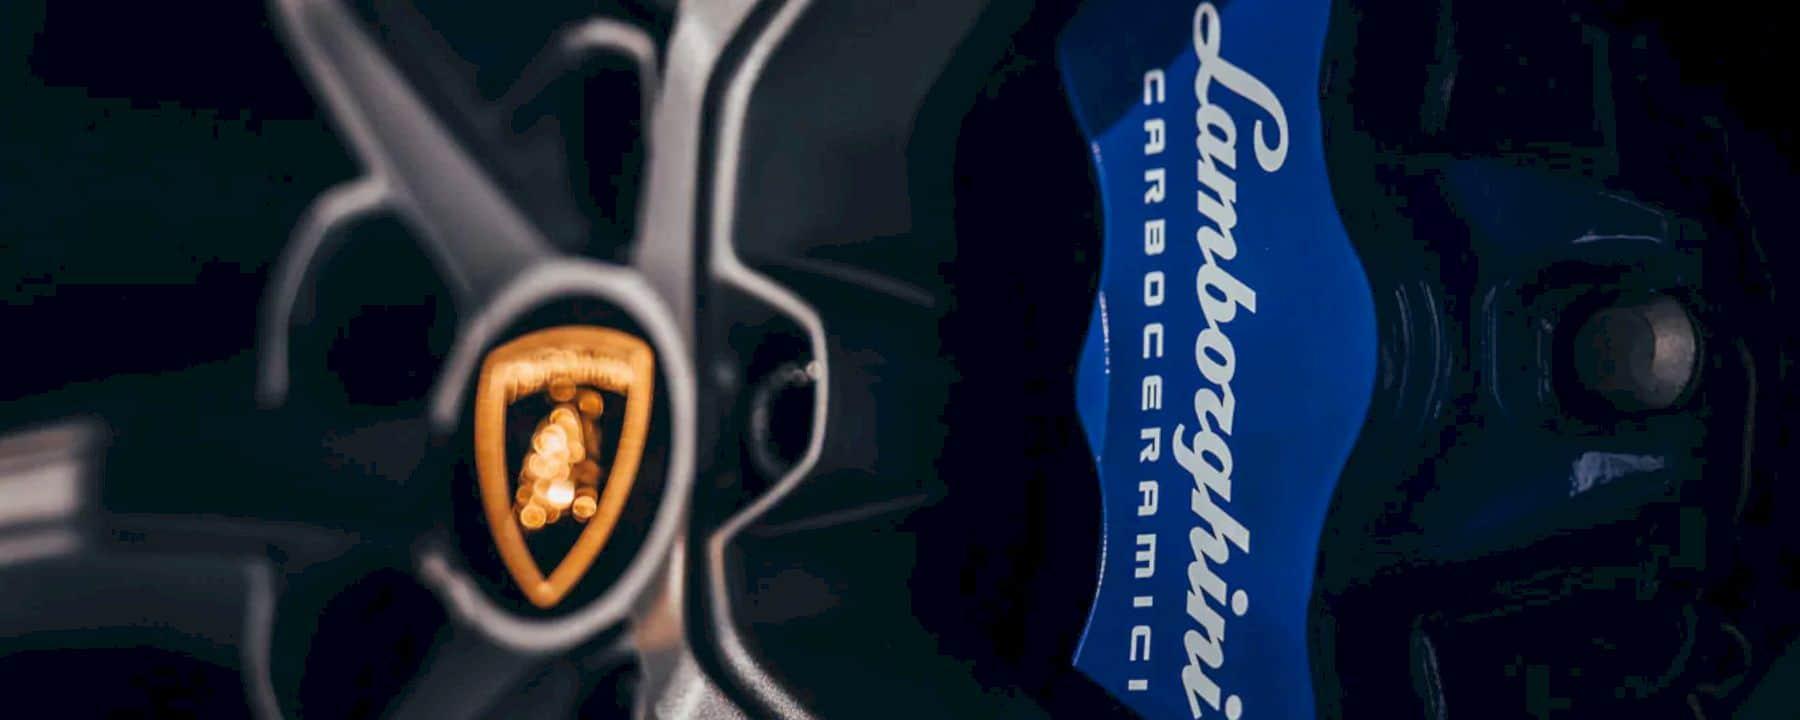 Lamborghini Huracan Evo Spyder 6